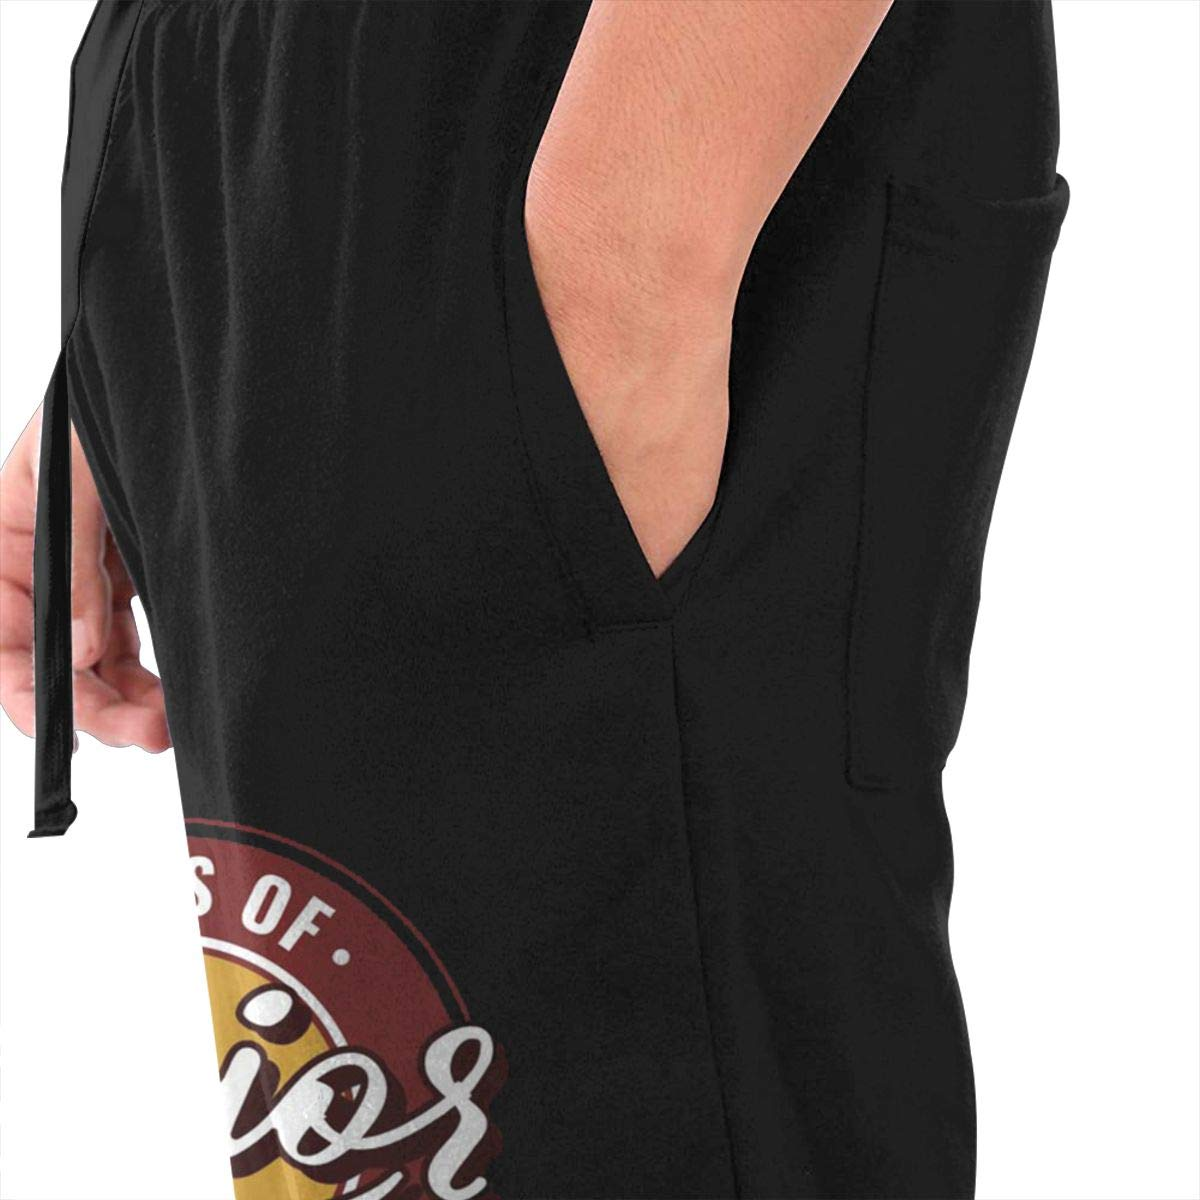 RYUIS Senior Class of 2019 Badge Drawstring Waist,100/% Cotton,Elastic Waist Cuffed,Jogger Sweatpants